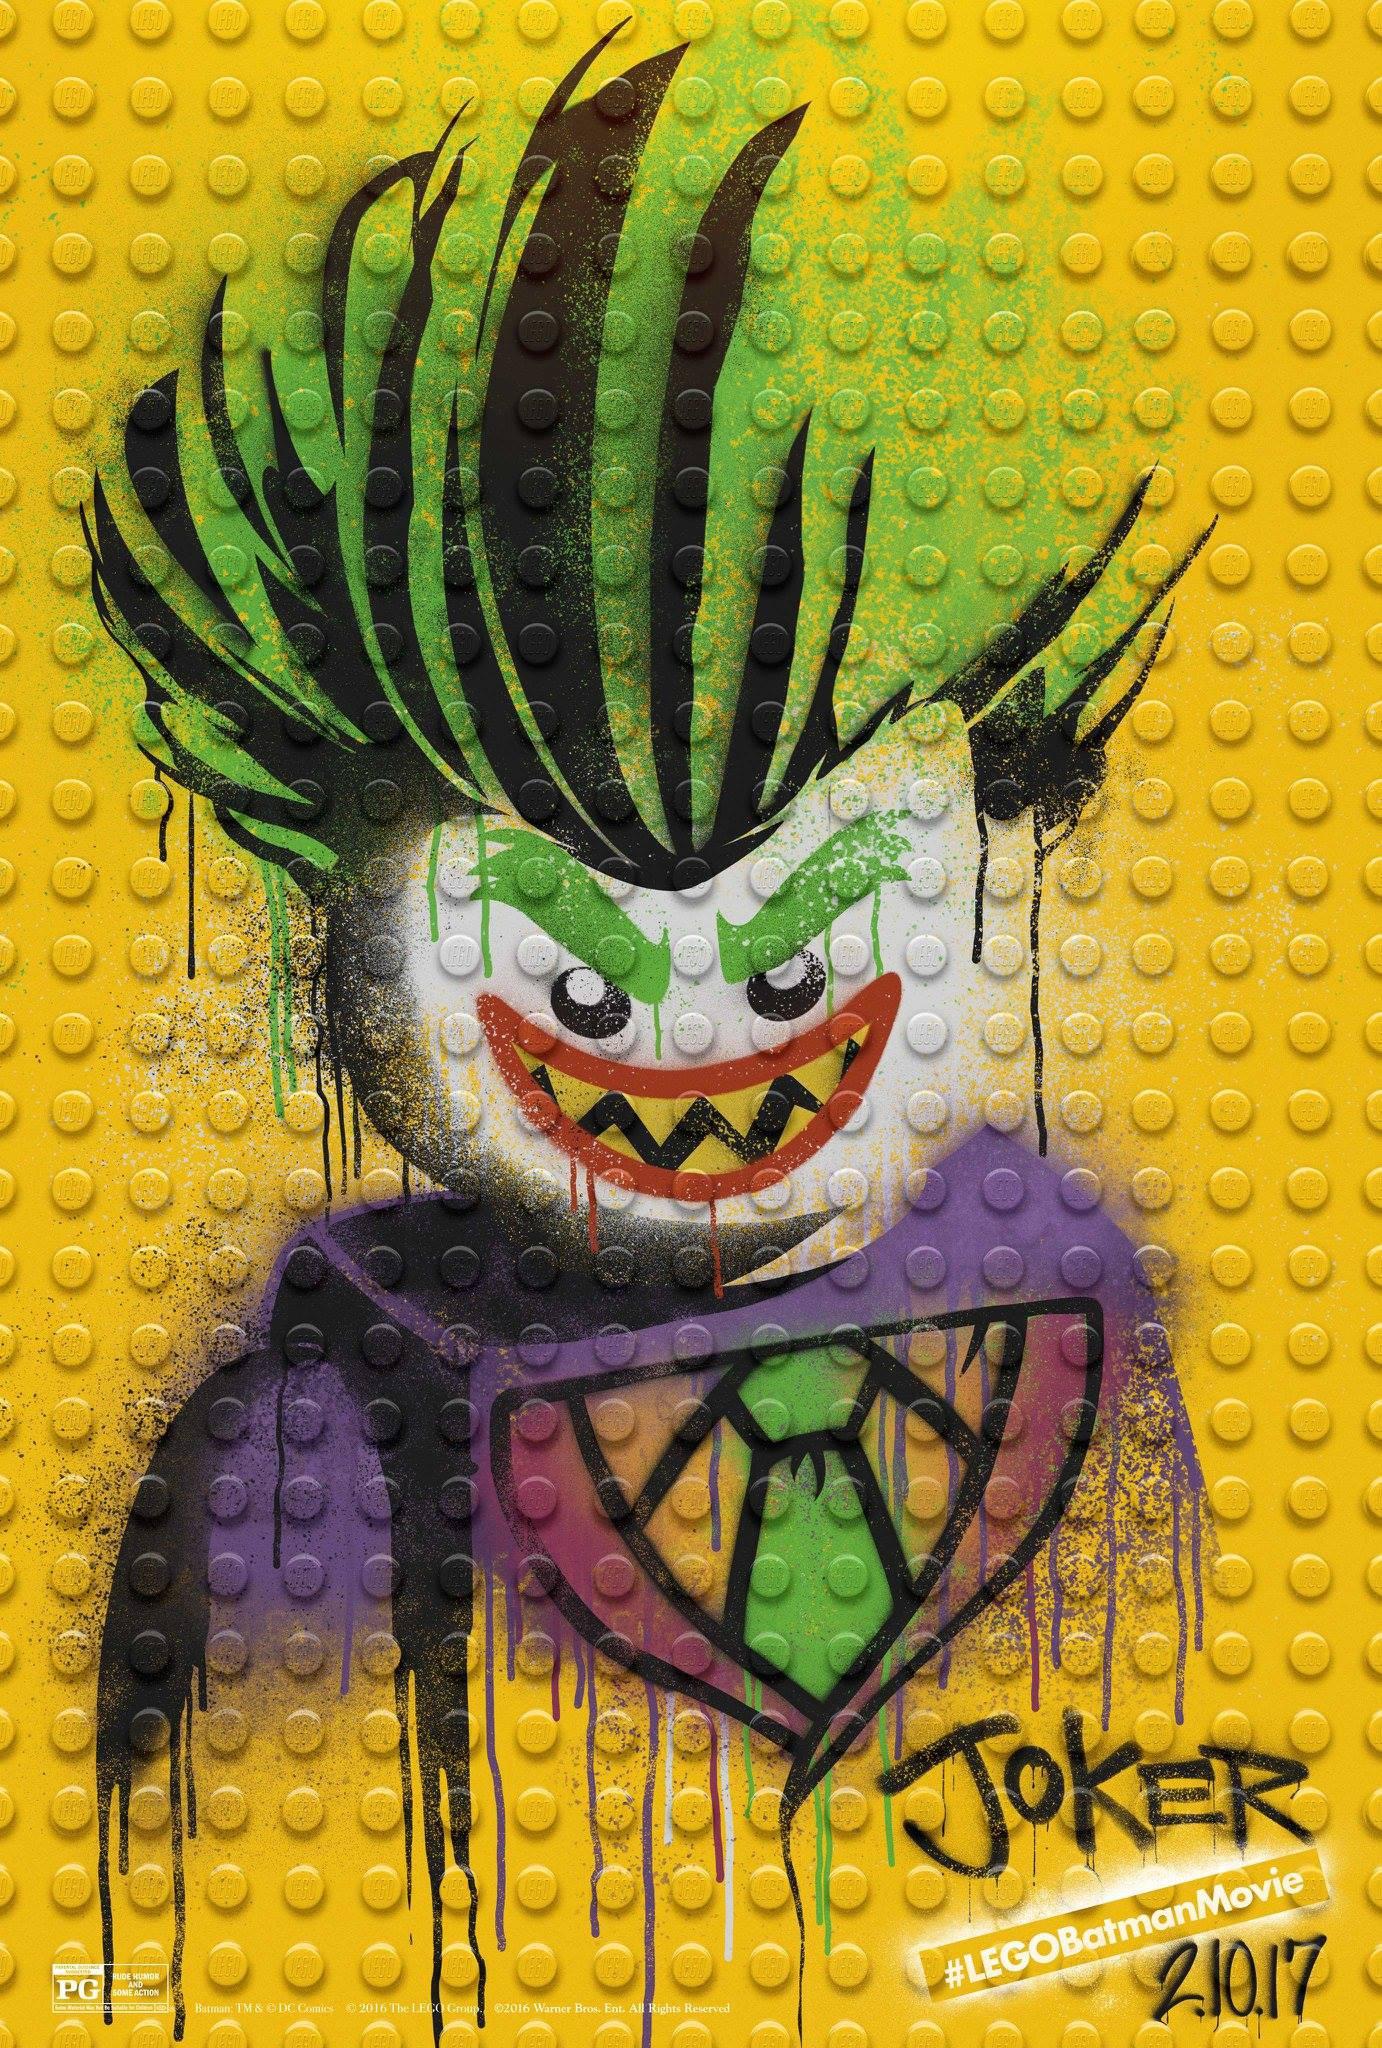 lego_batman_movie_p16.png